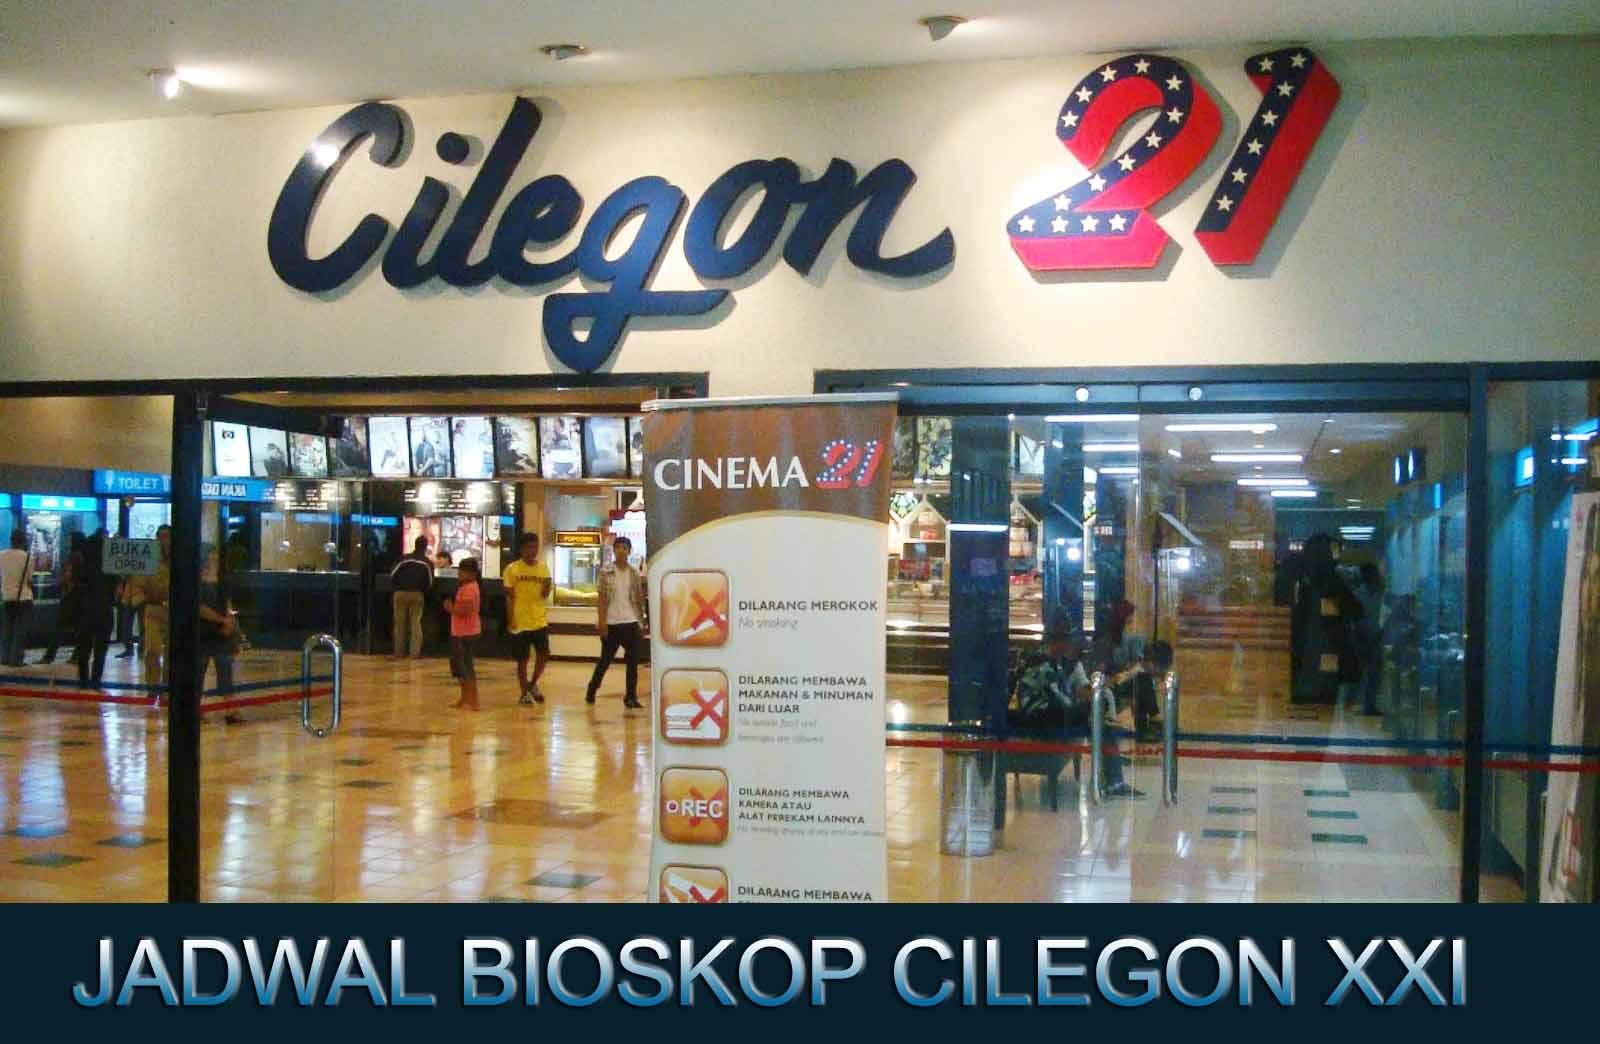 JADWAL BIOSKOP CILEGON XXI